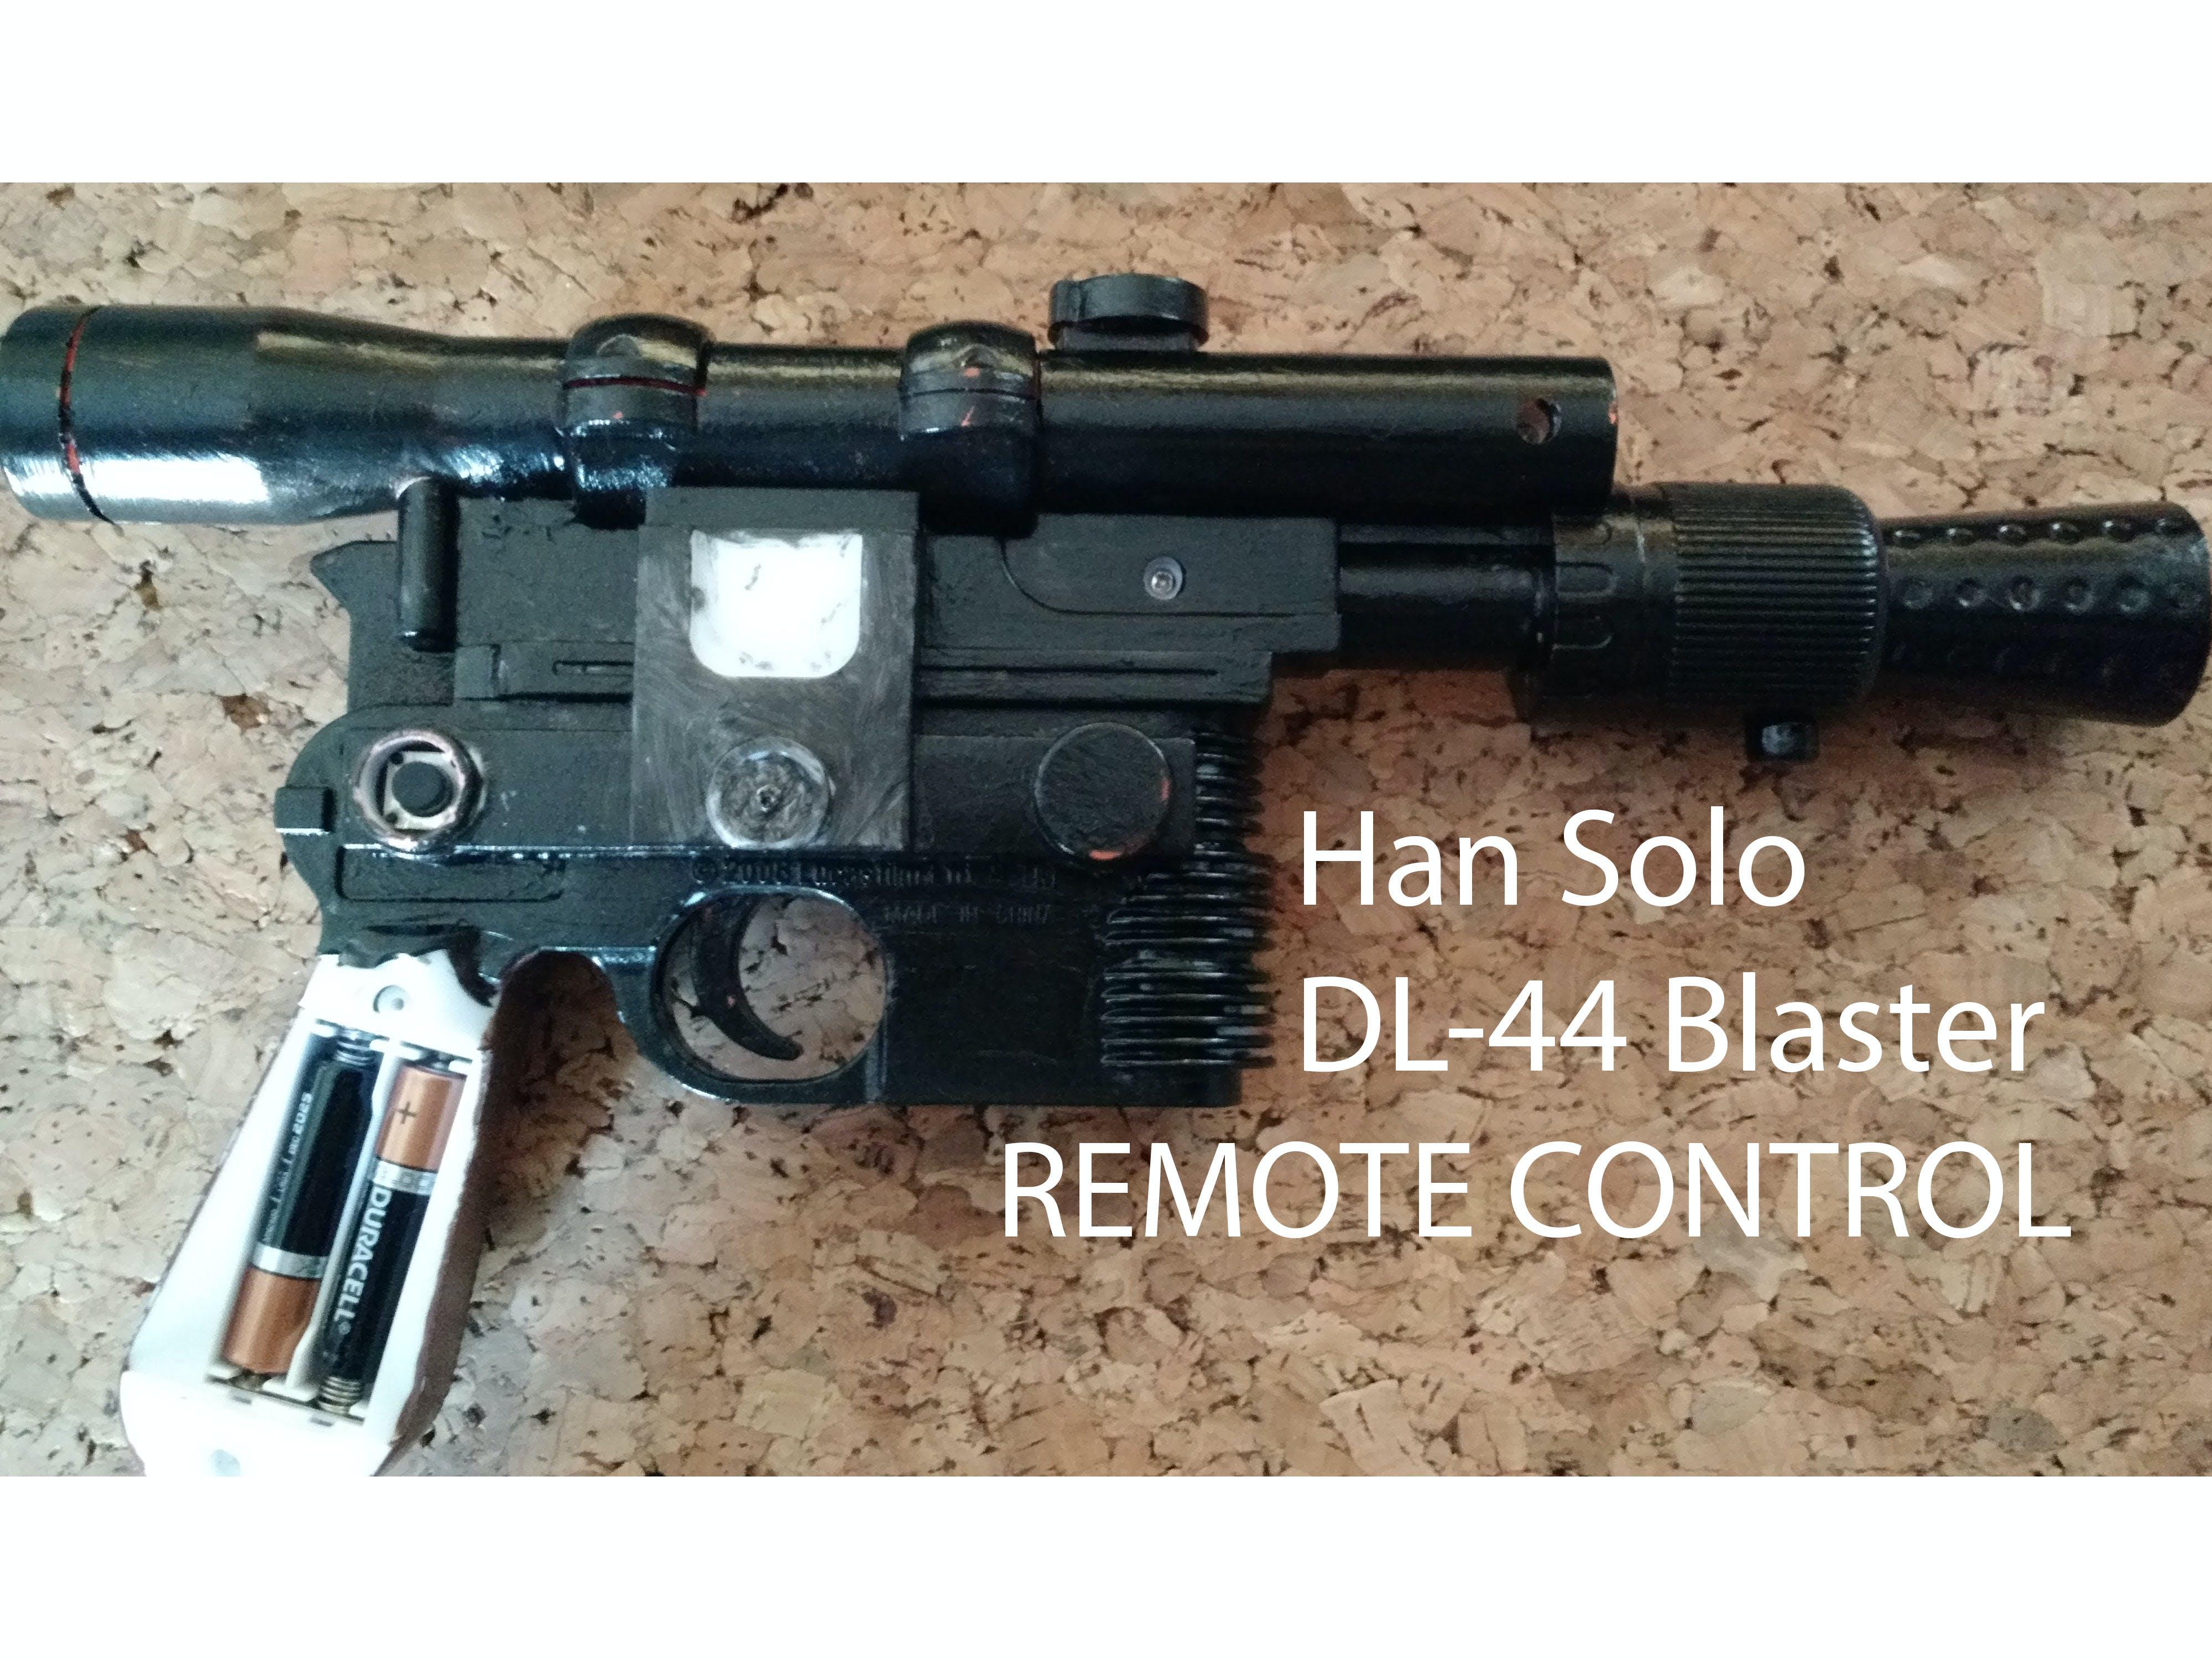 Han Solo DL-44 Blaster Remote